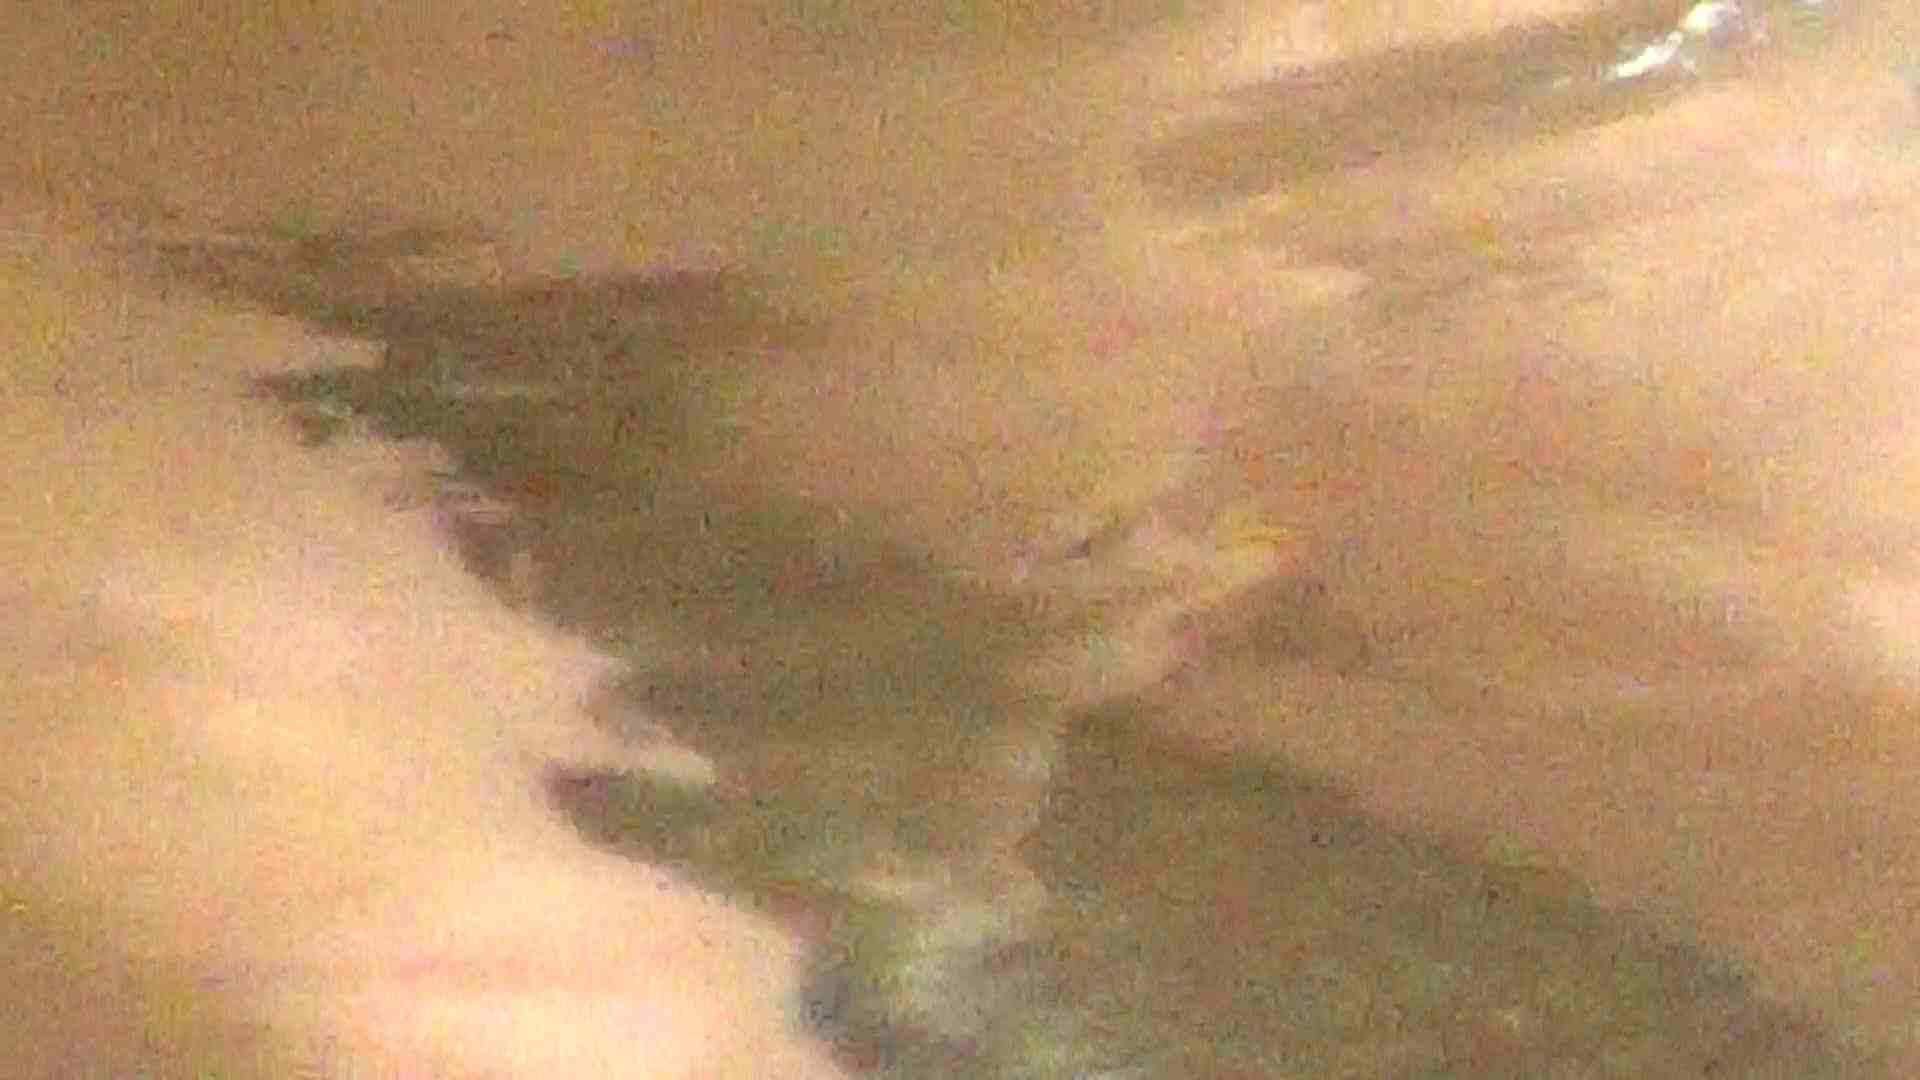 Aquaな露天風呂Vol.244 露天風呂 セックス画像 95連発 92